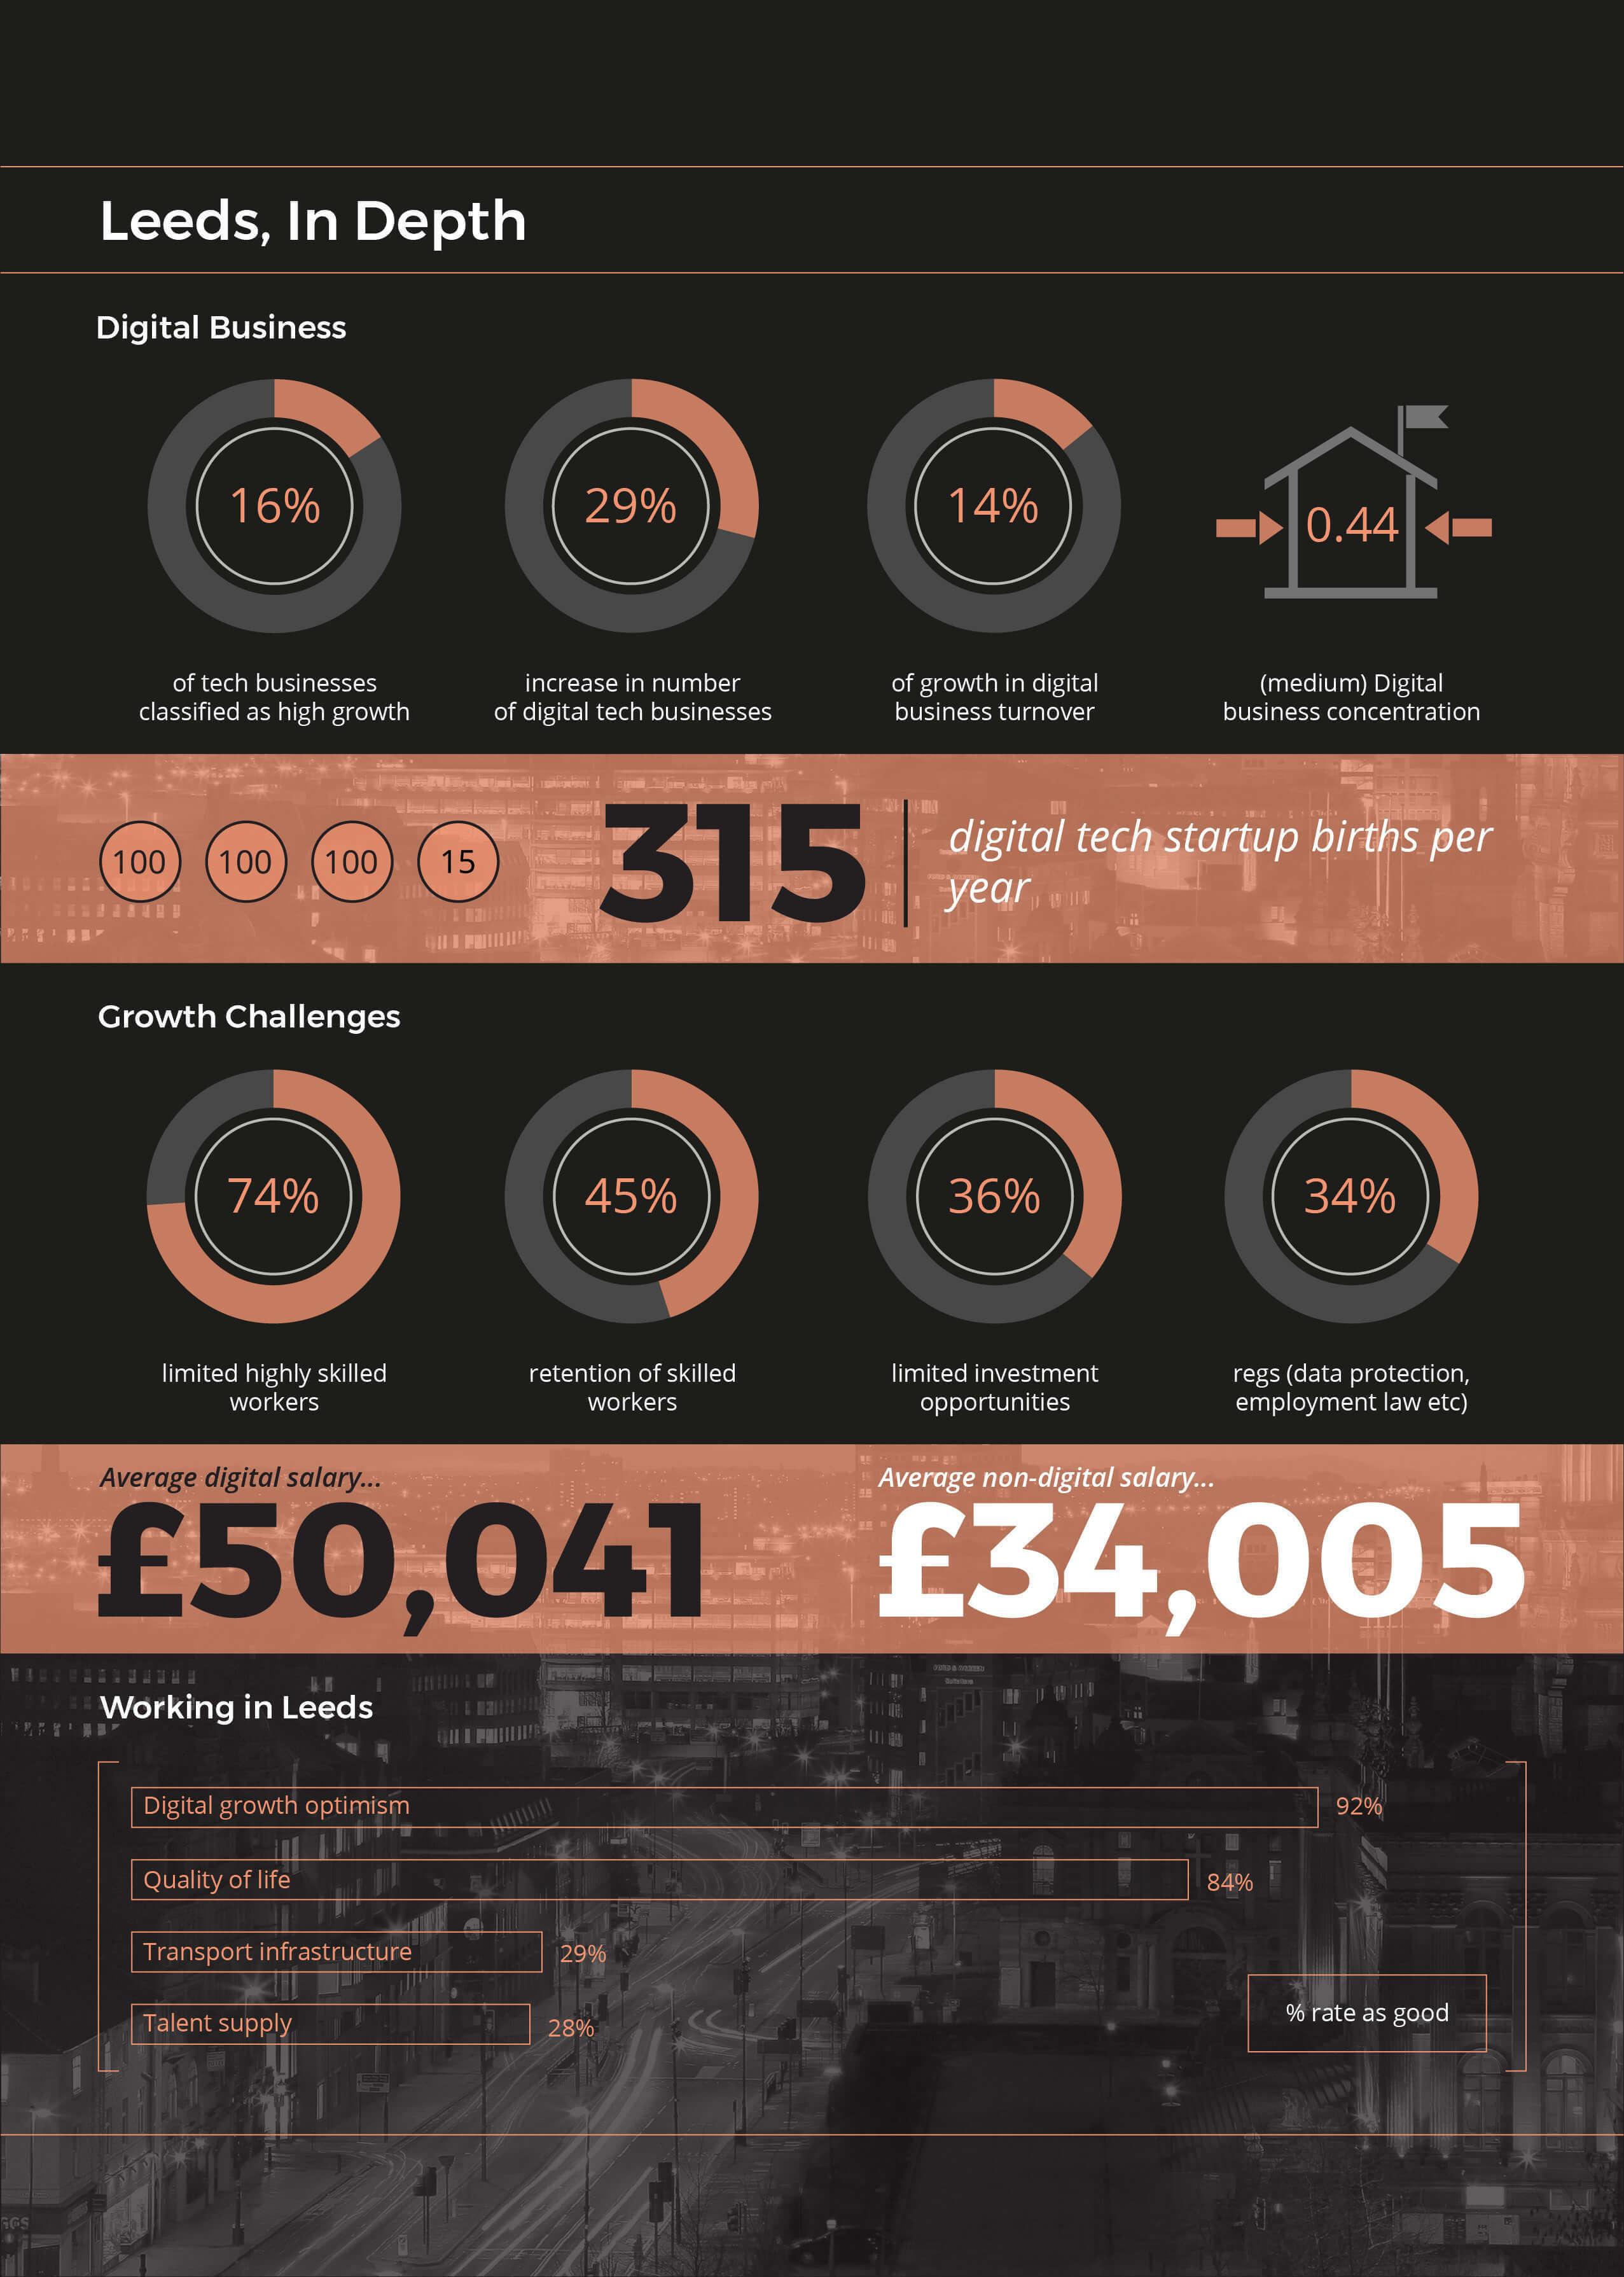 Leeds Digital Economy In Numbers Infographic - In Depth